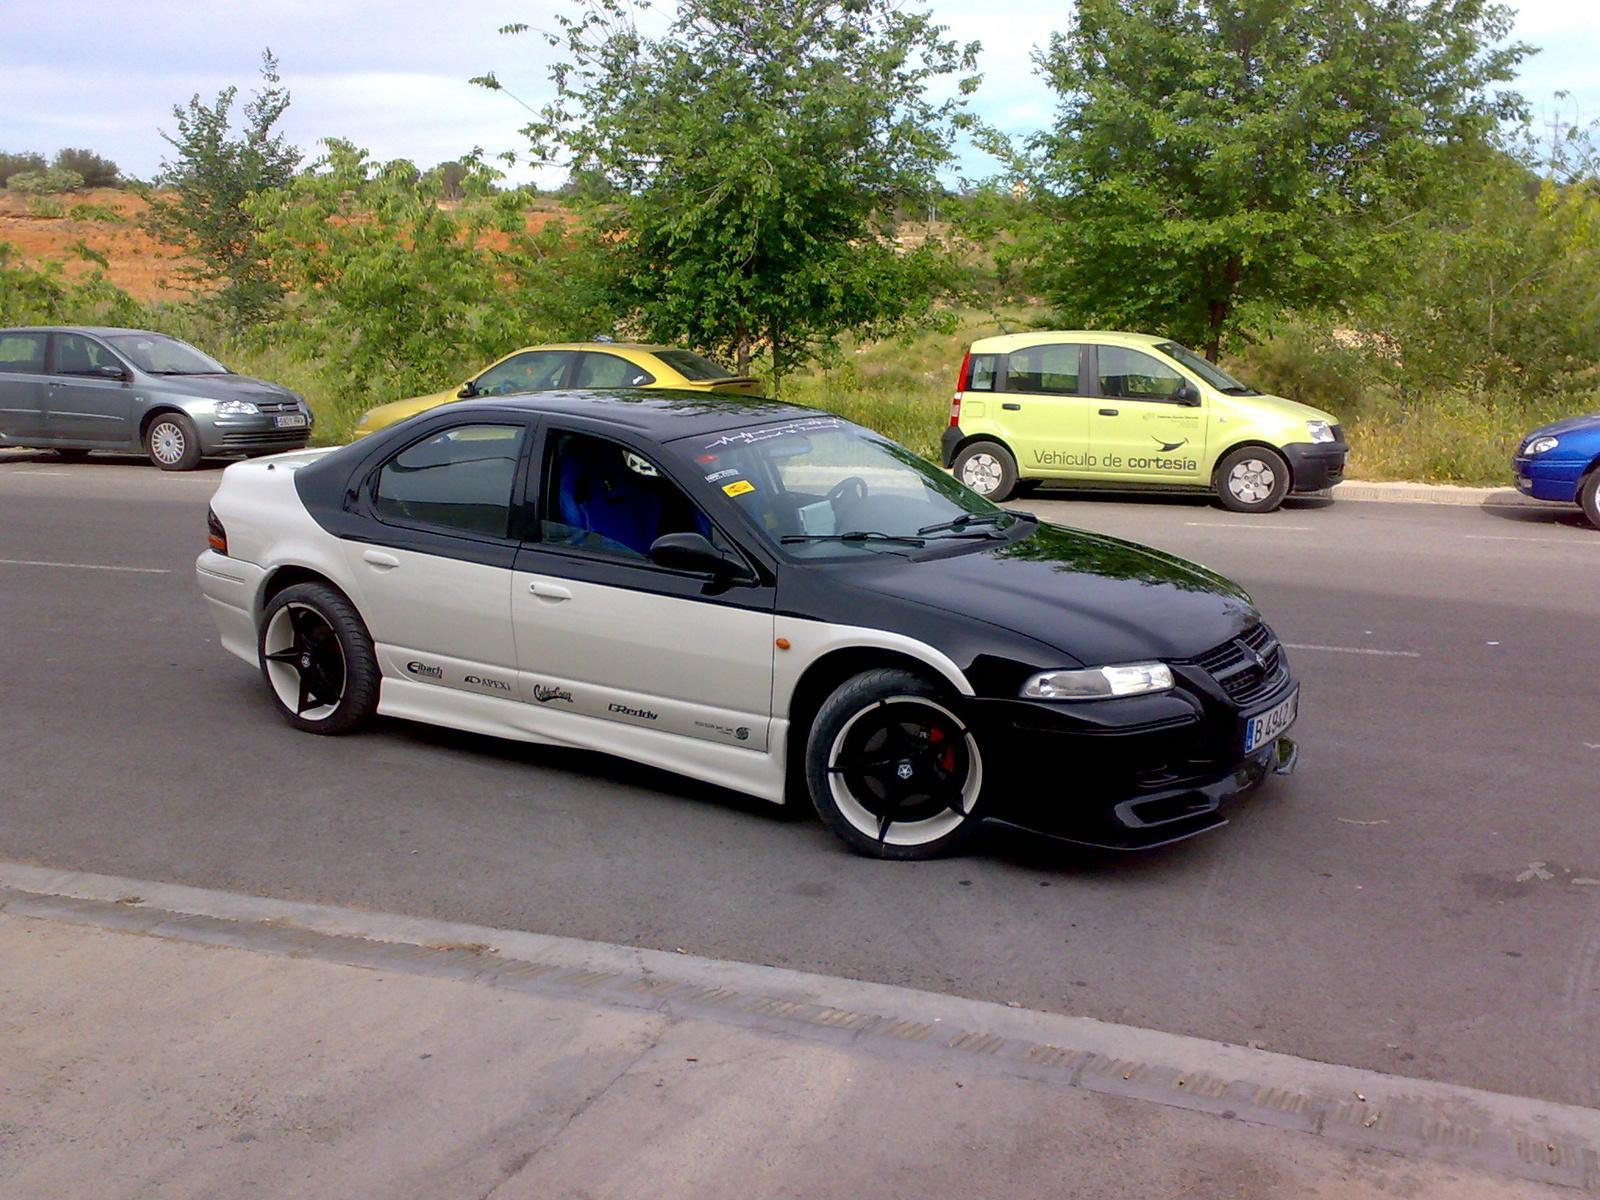 1998 Chrysler Cirrus Information And Photos Zombiedrive 2000 Engine Diagram 800 1024 1280 1600 Origin